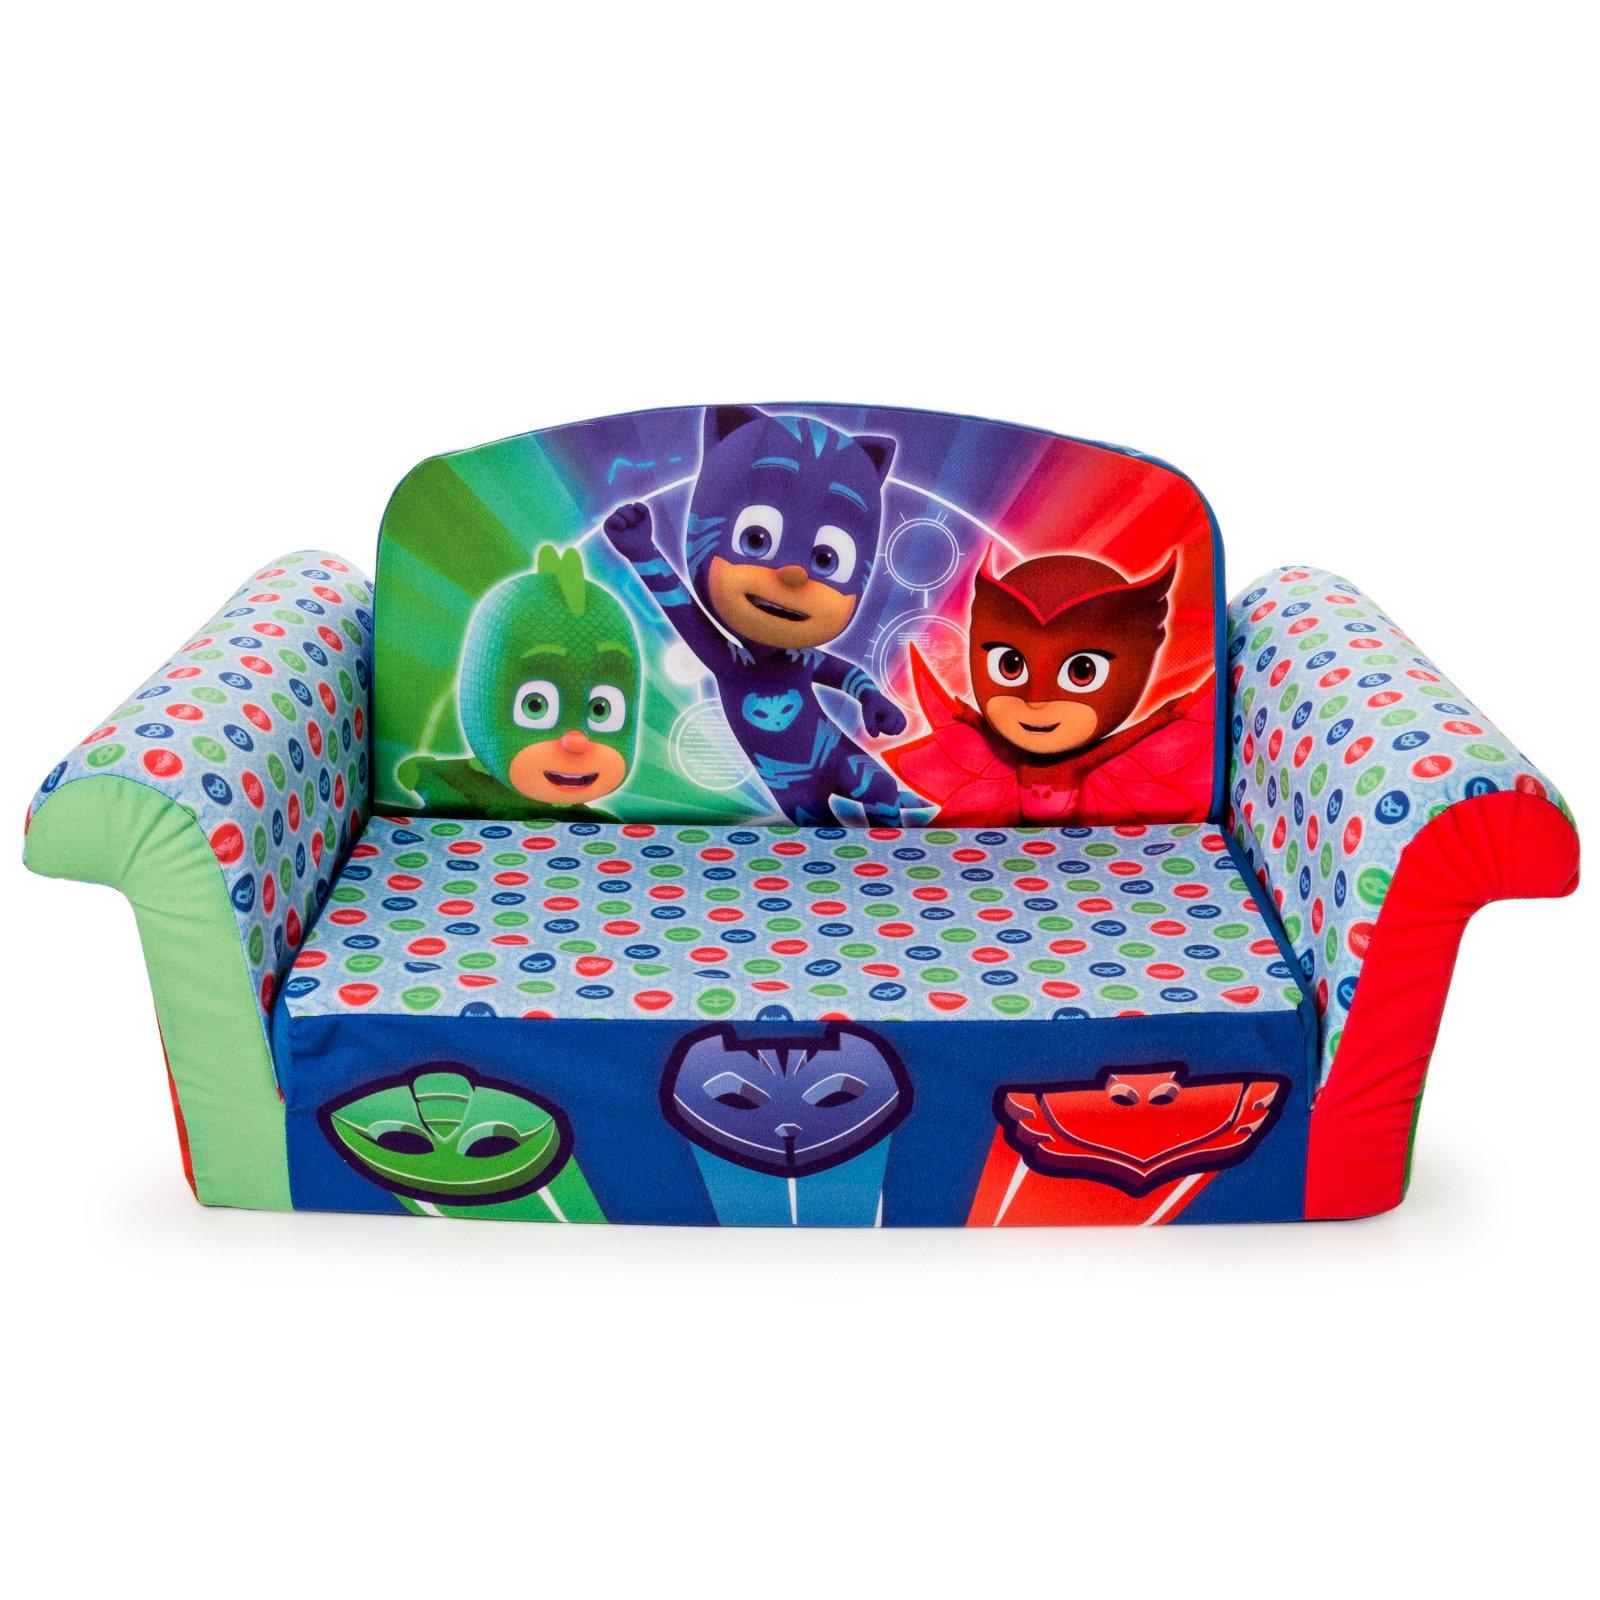 Marshmallow Furniture - Childrens 2 in 1 Flip Open Foam Sofa, PJ Masks Flip Open